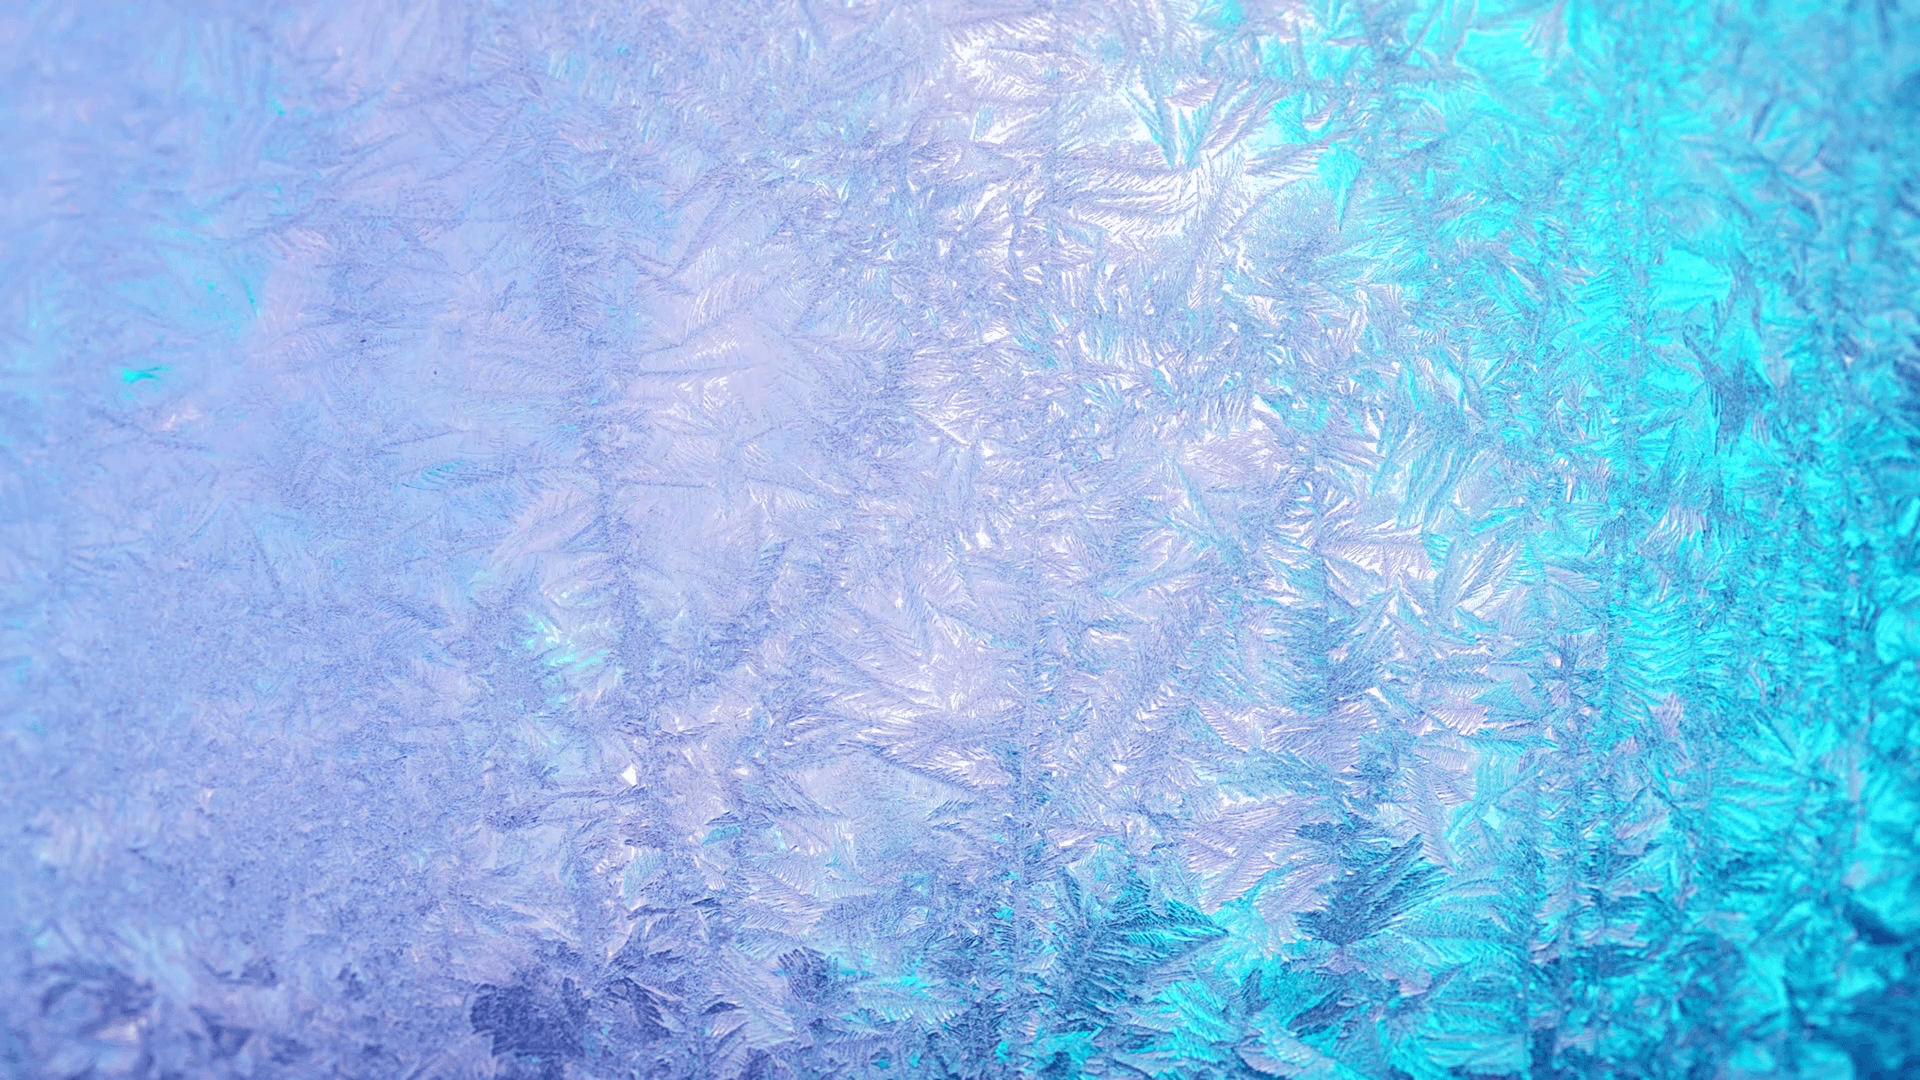 Frozen Backgrounds.